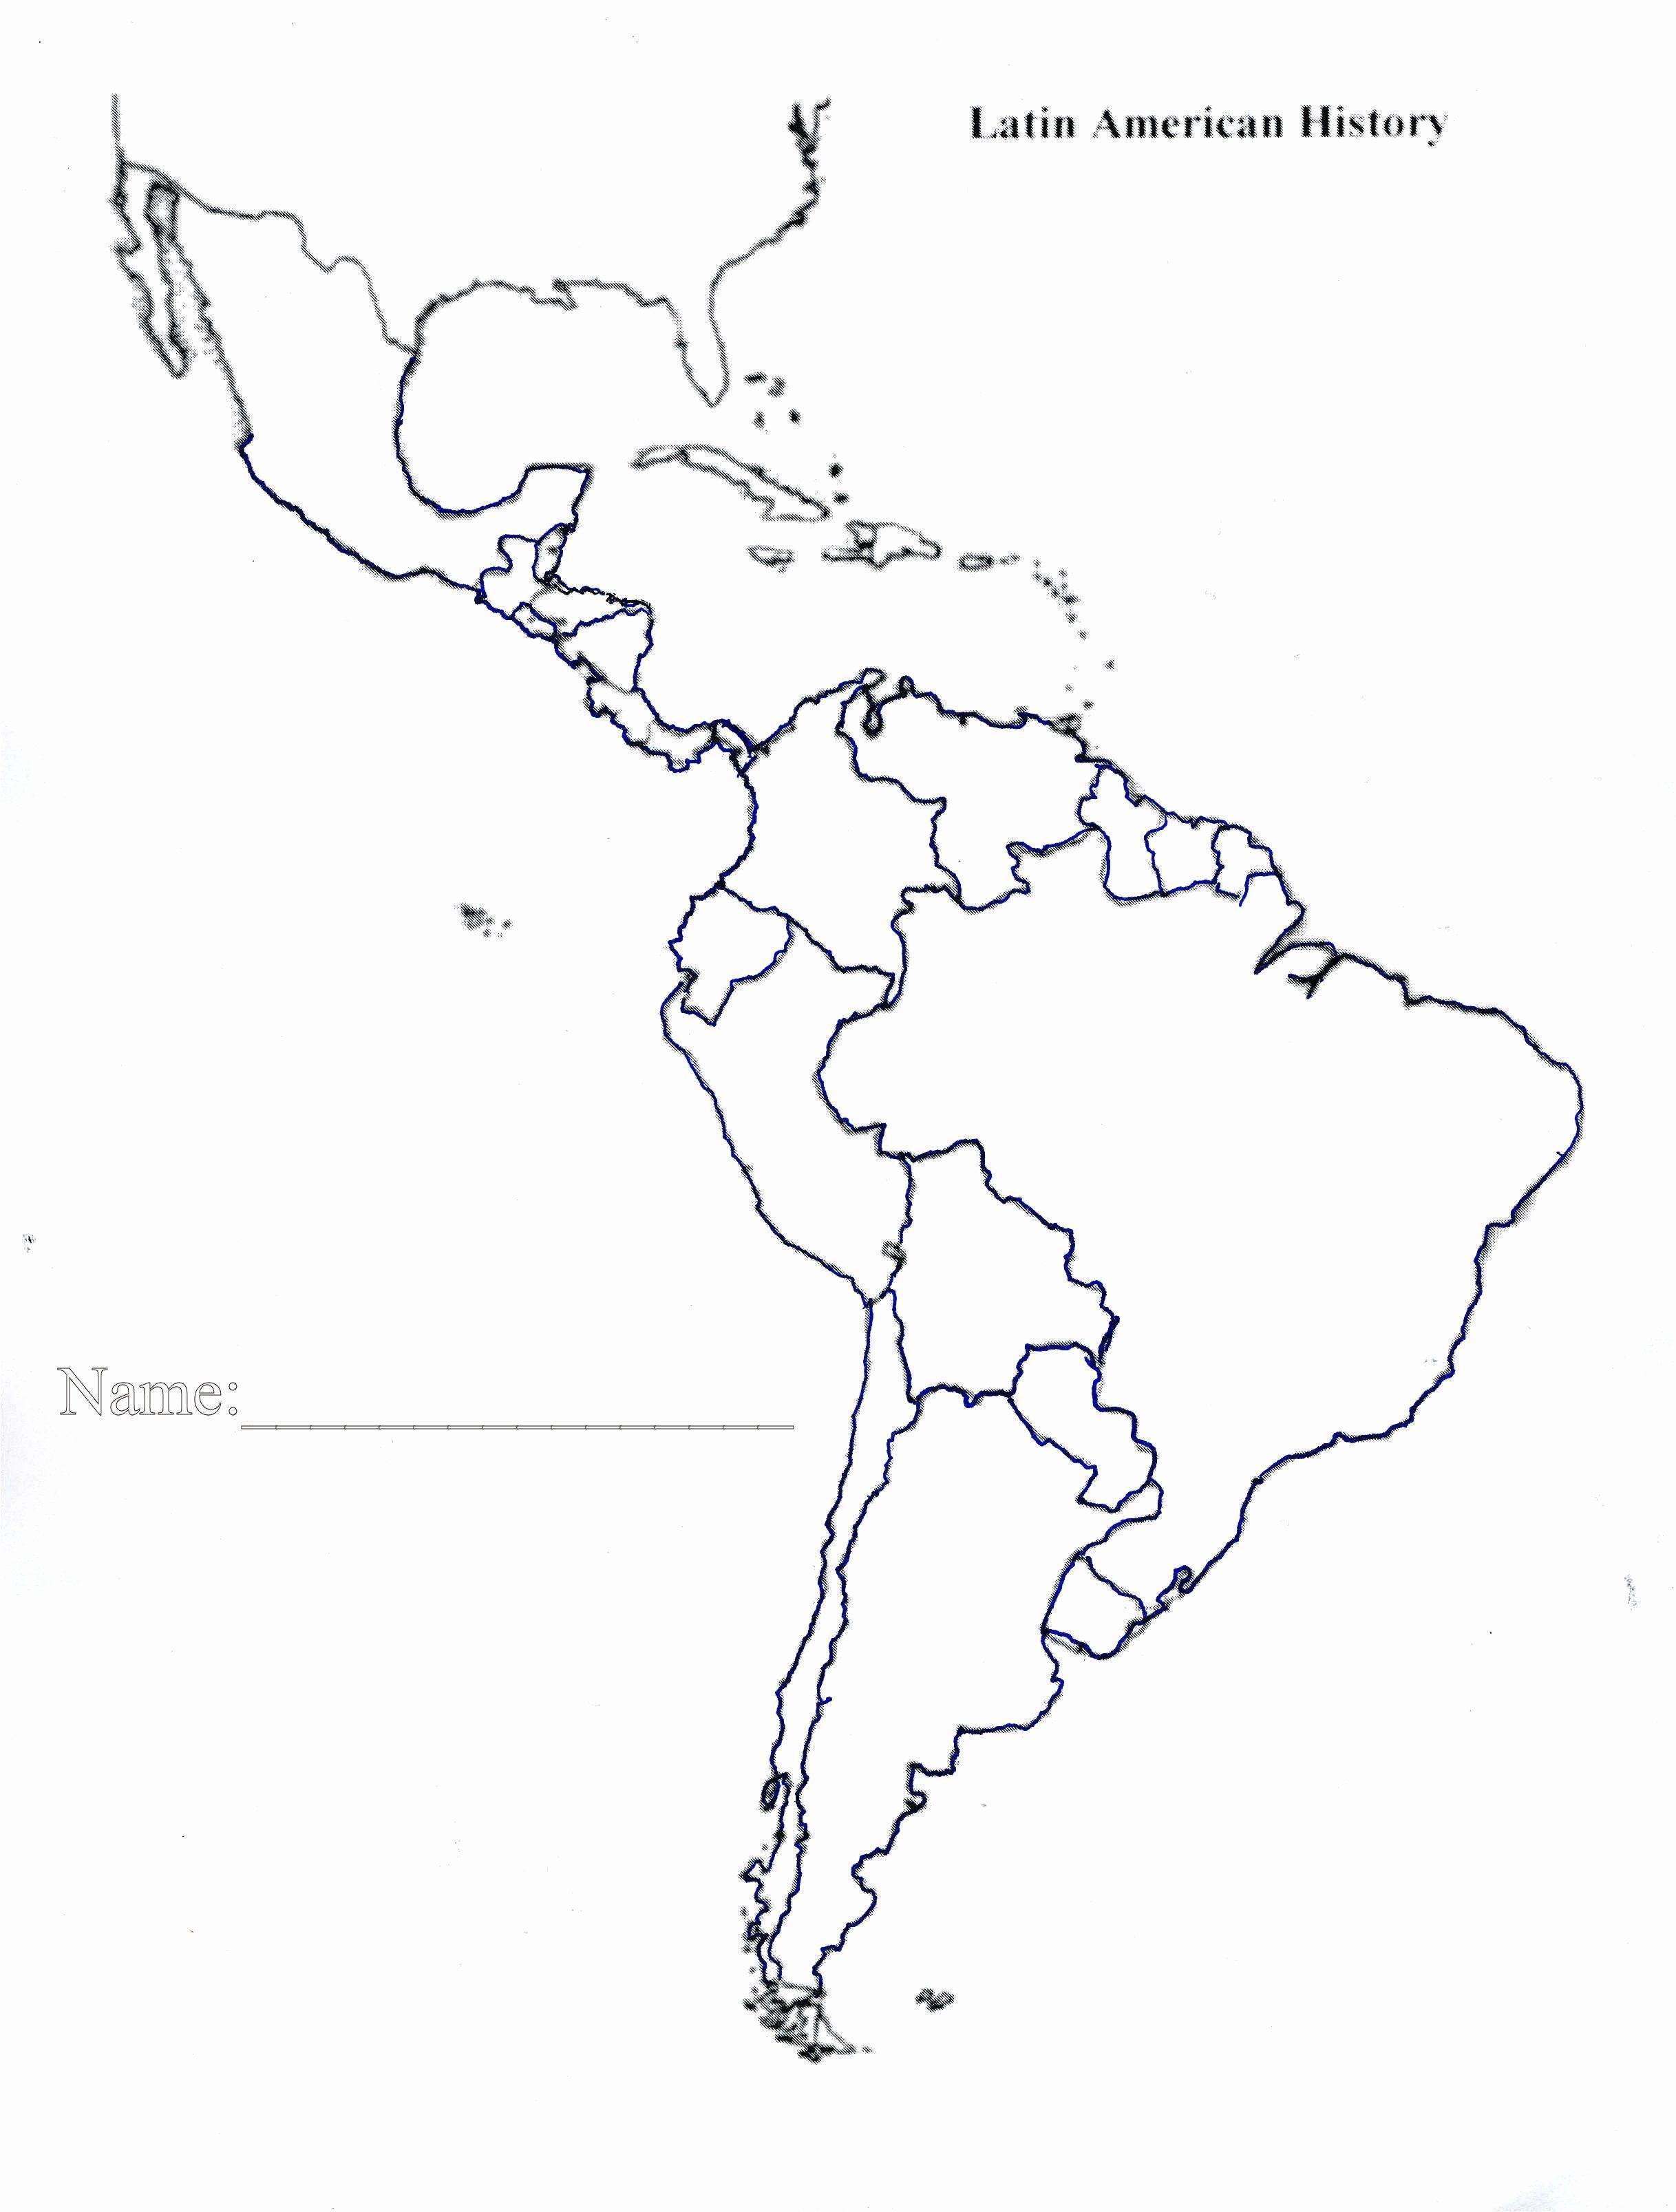 South America Map Coloring Page Lovely 18 Punctual Central And South America Outline Map Halaman Mewarnai Halaman Mewarnai Bunga